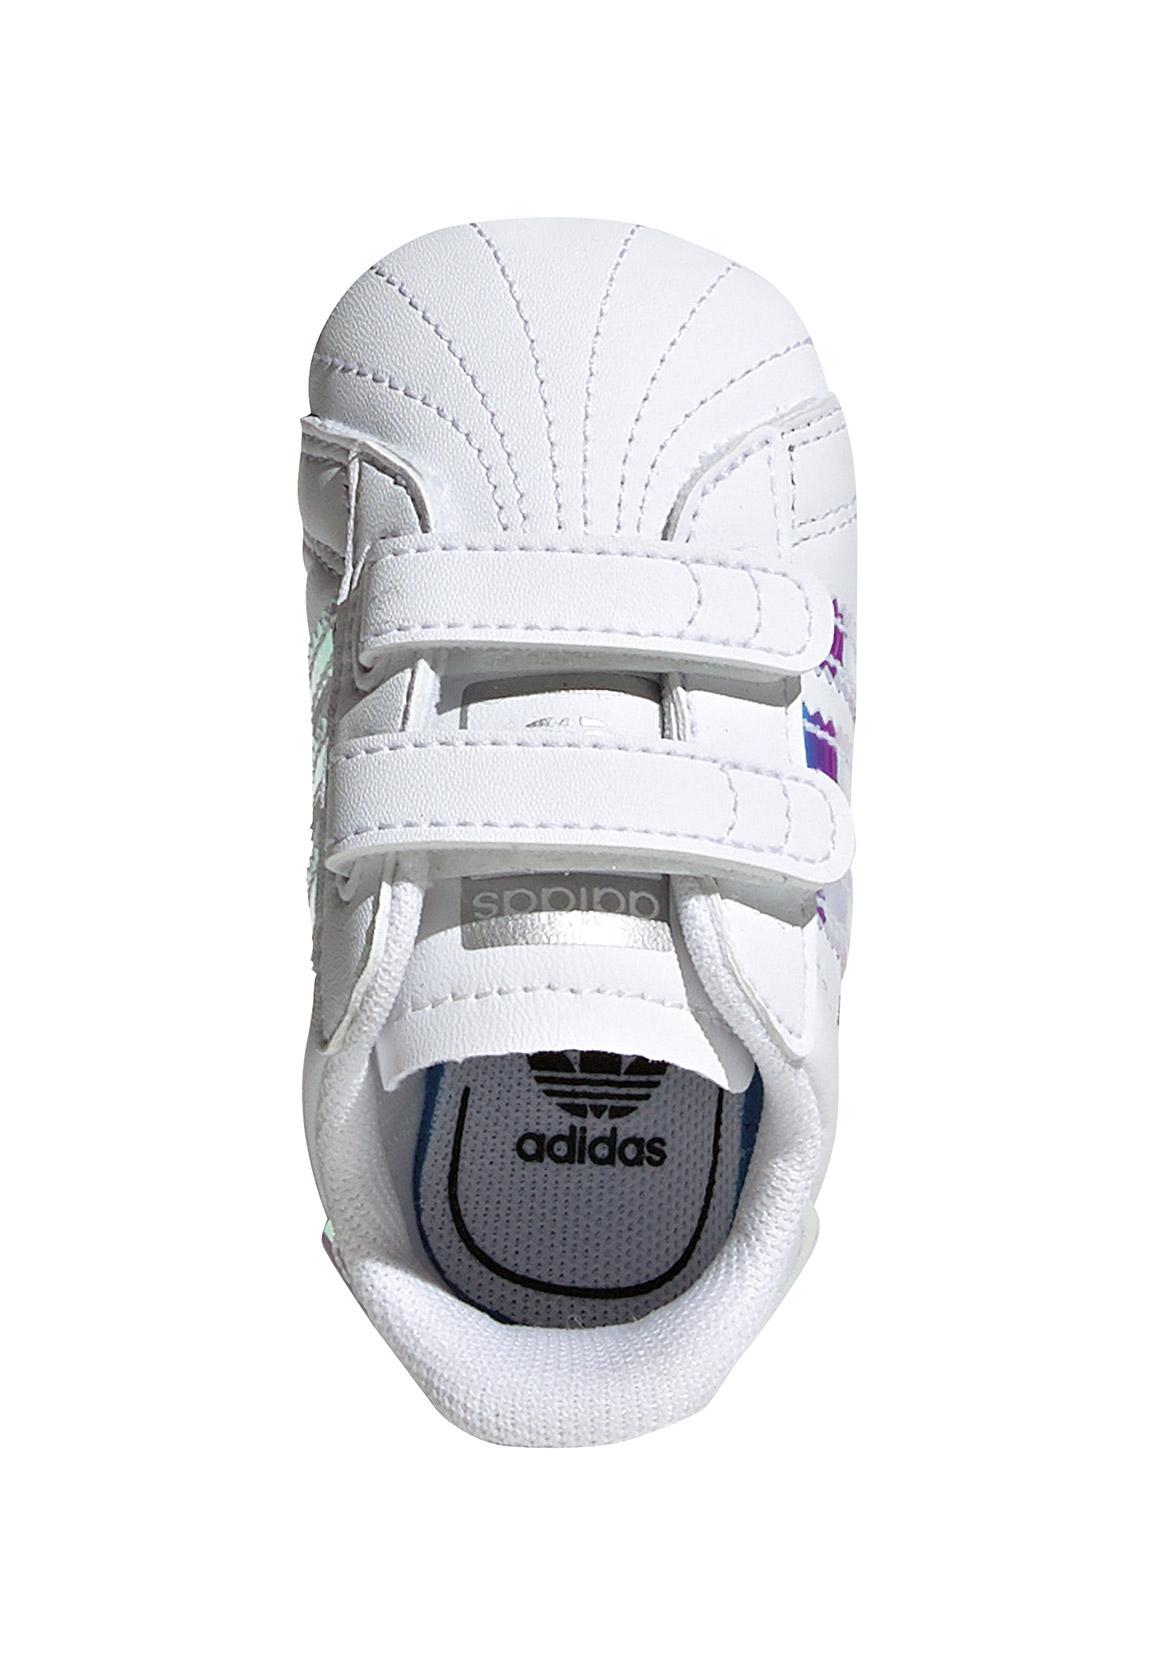 Adidas Babyschuhe SUPERSTAR CRIB BD8000 Weiss